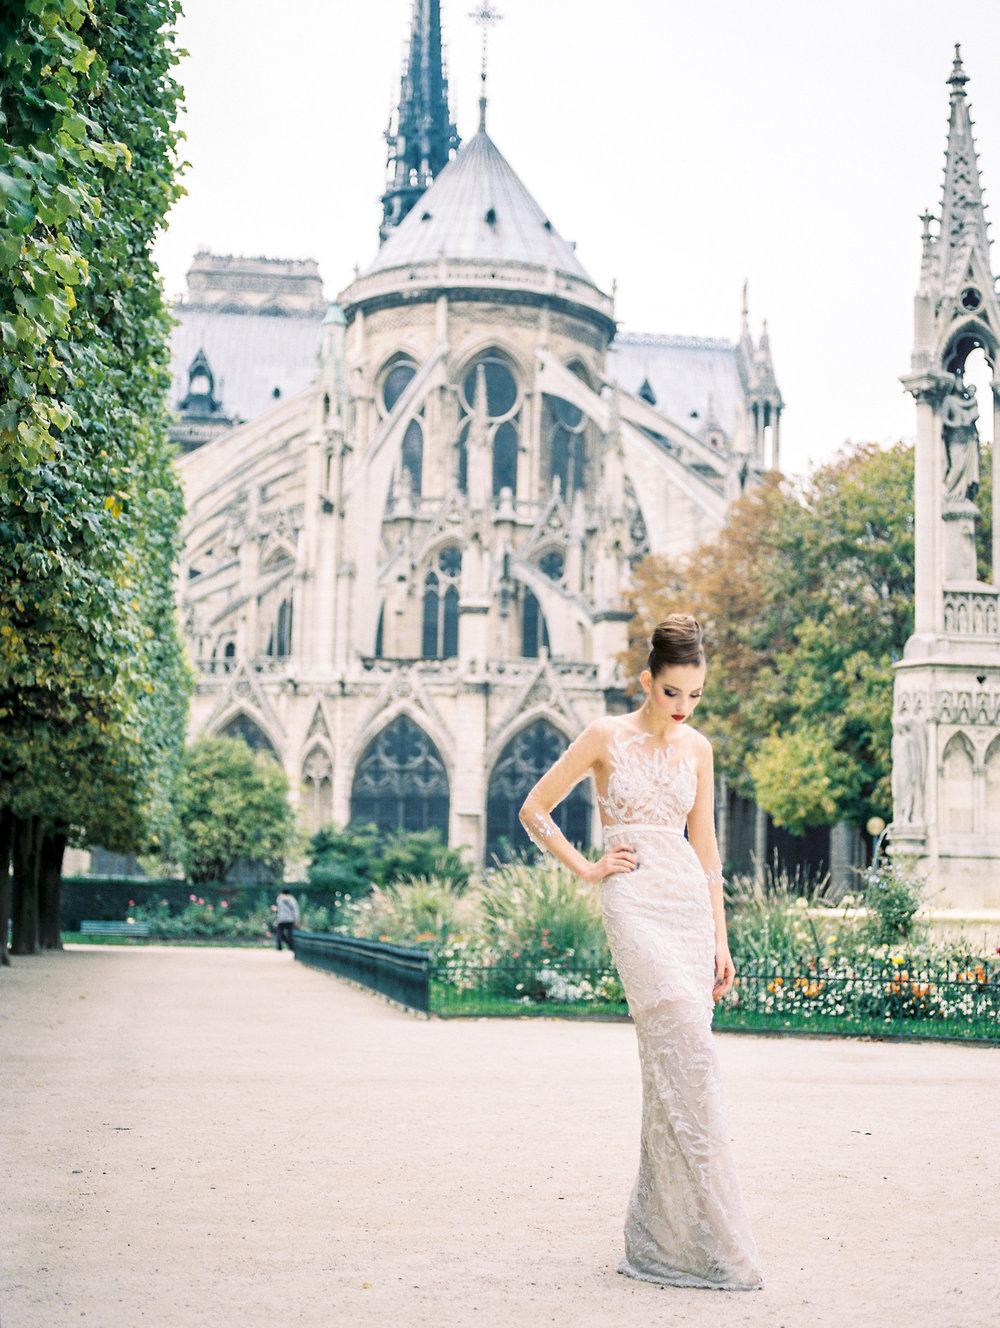 elopement inspiration in paris destination fine art wedding photographer lissa ryan photography